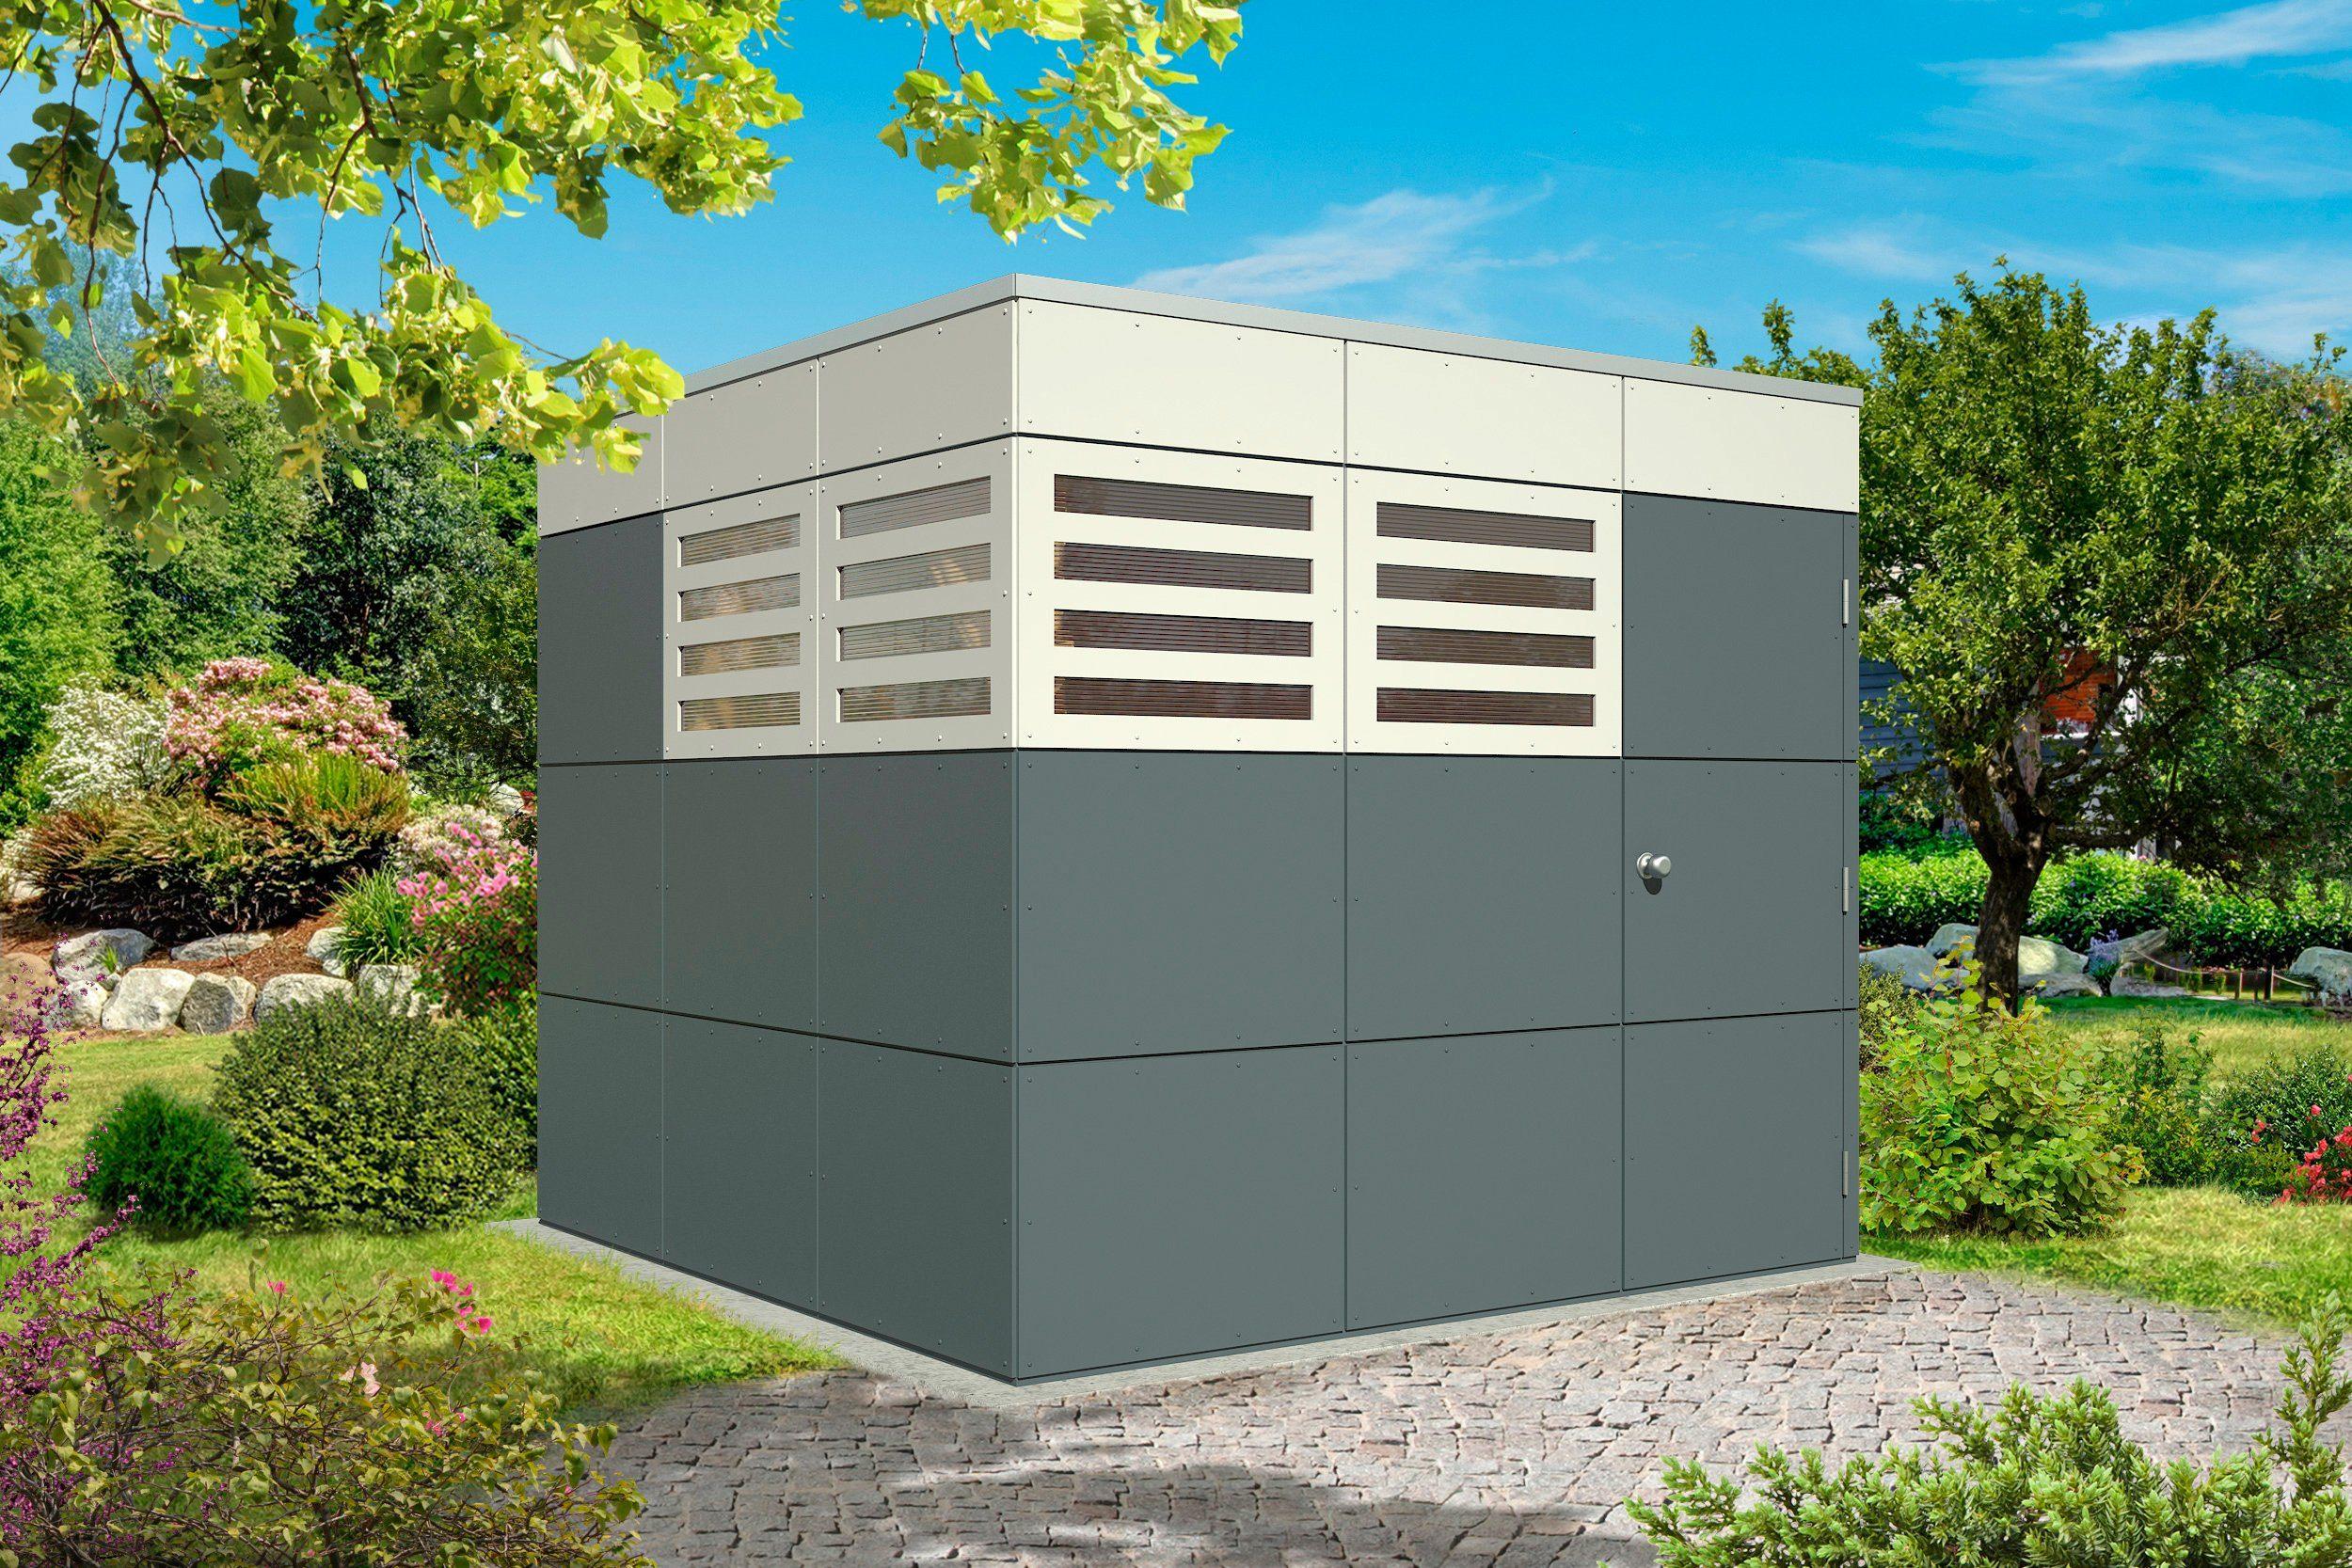 SKANHOLZ Gartenhaus »CrossCube Perth 3«, BxT: 253x253 cm, dunkelgrau/hellgrau